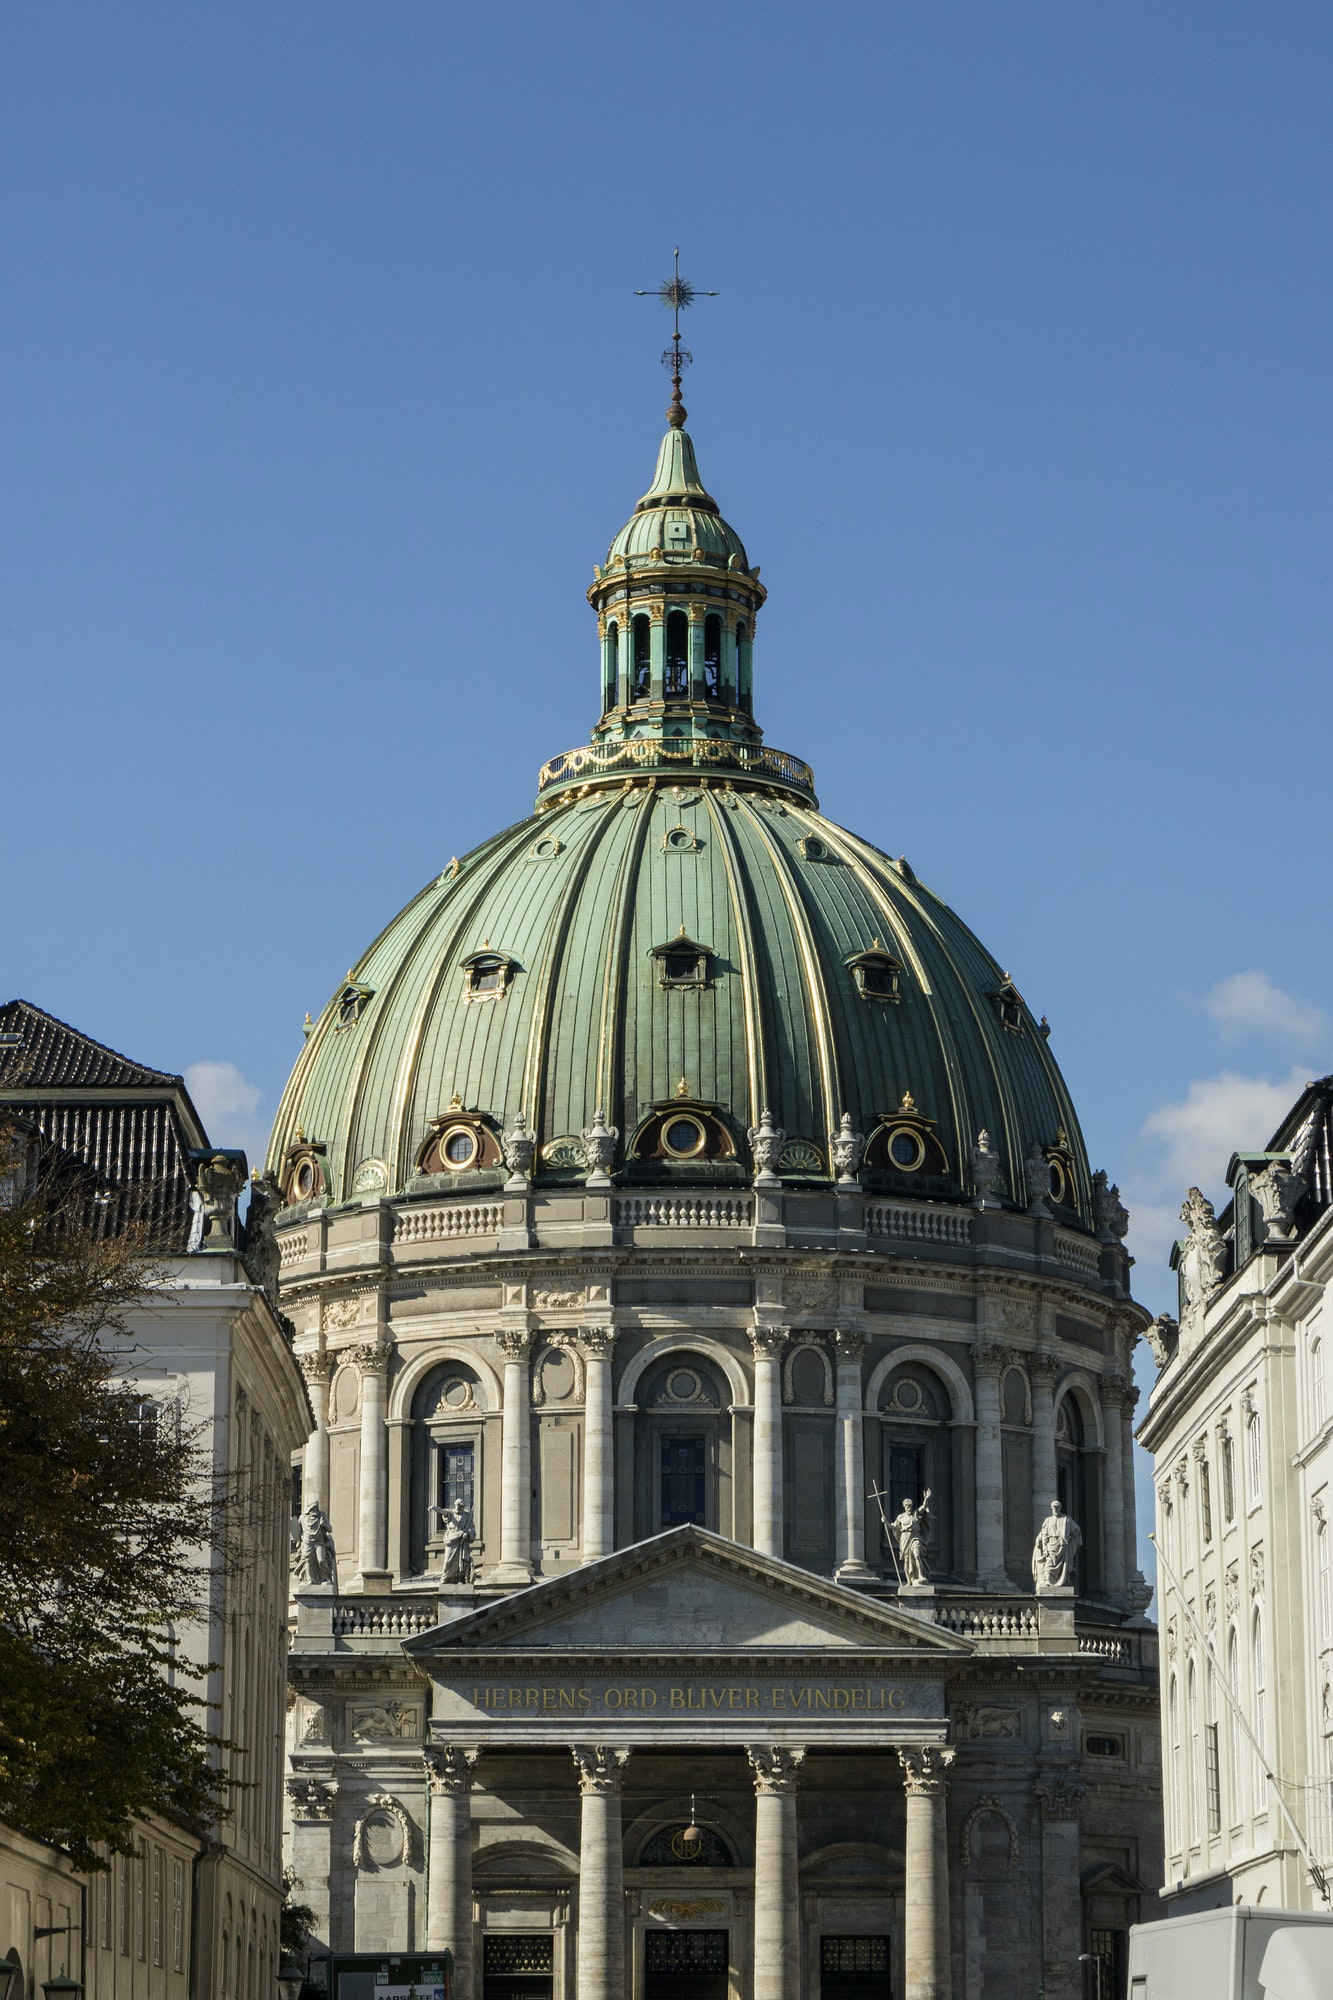 Frederik's Church or Marble Church on Frederiksgade in Copenhag